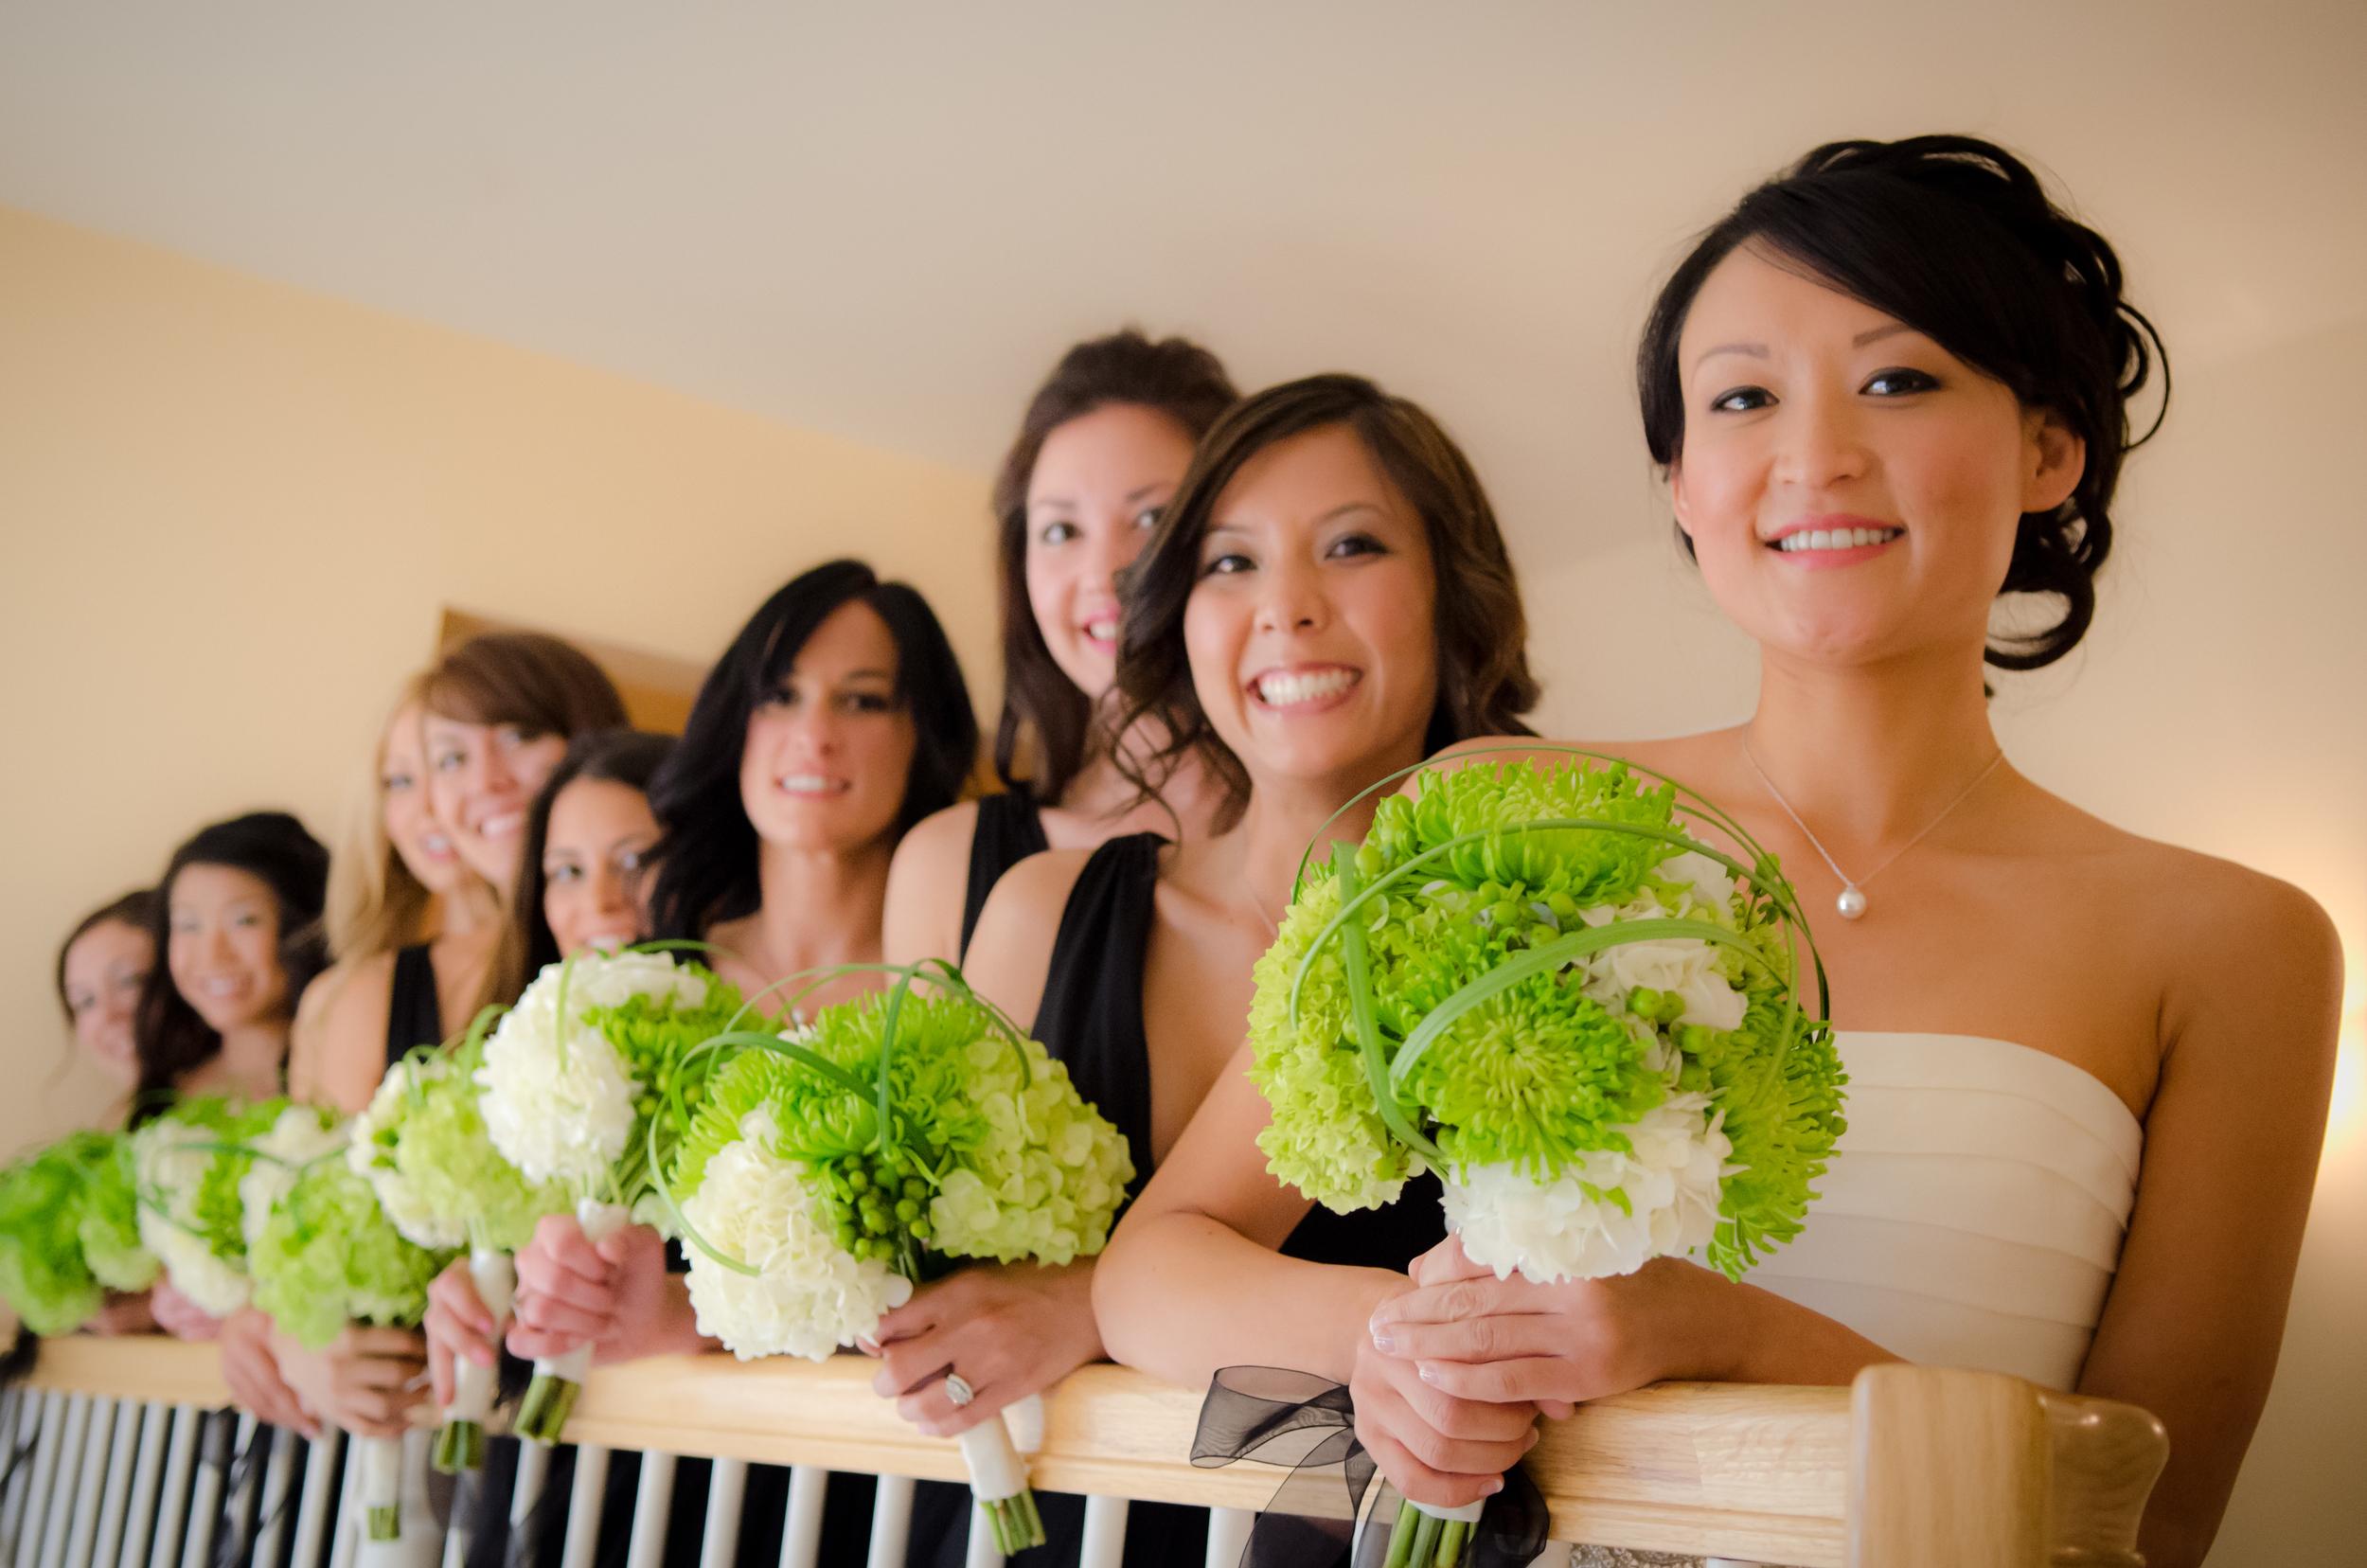 bridesmaids_8117453828_o.jpg